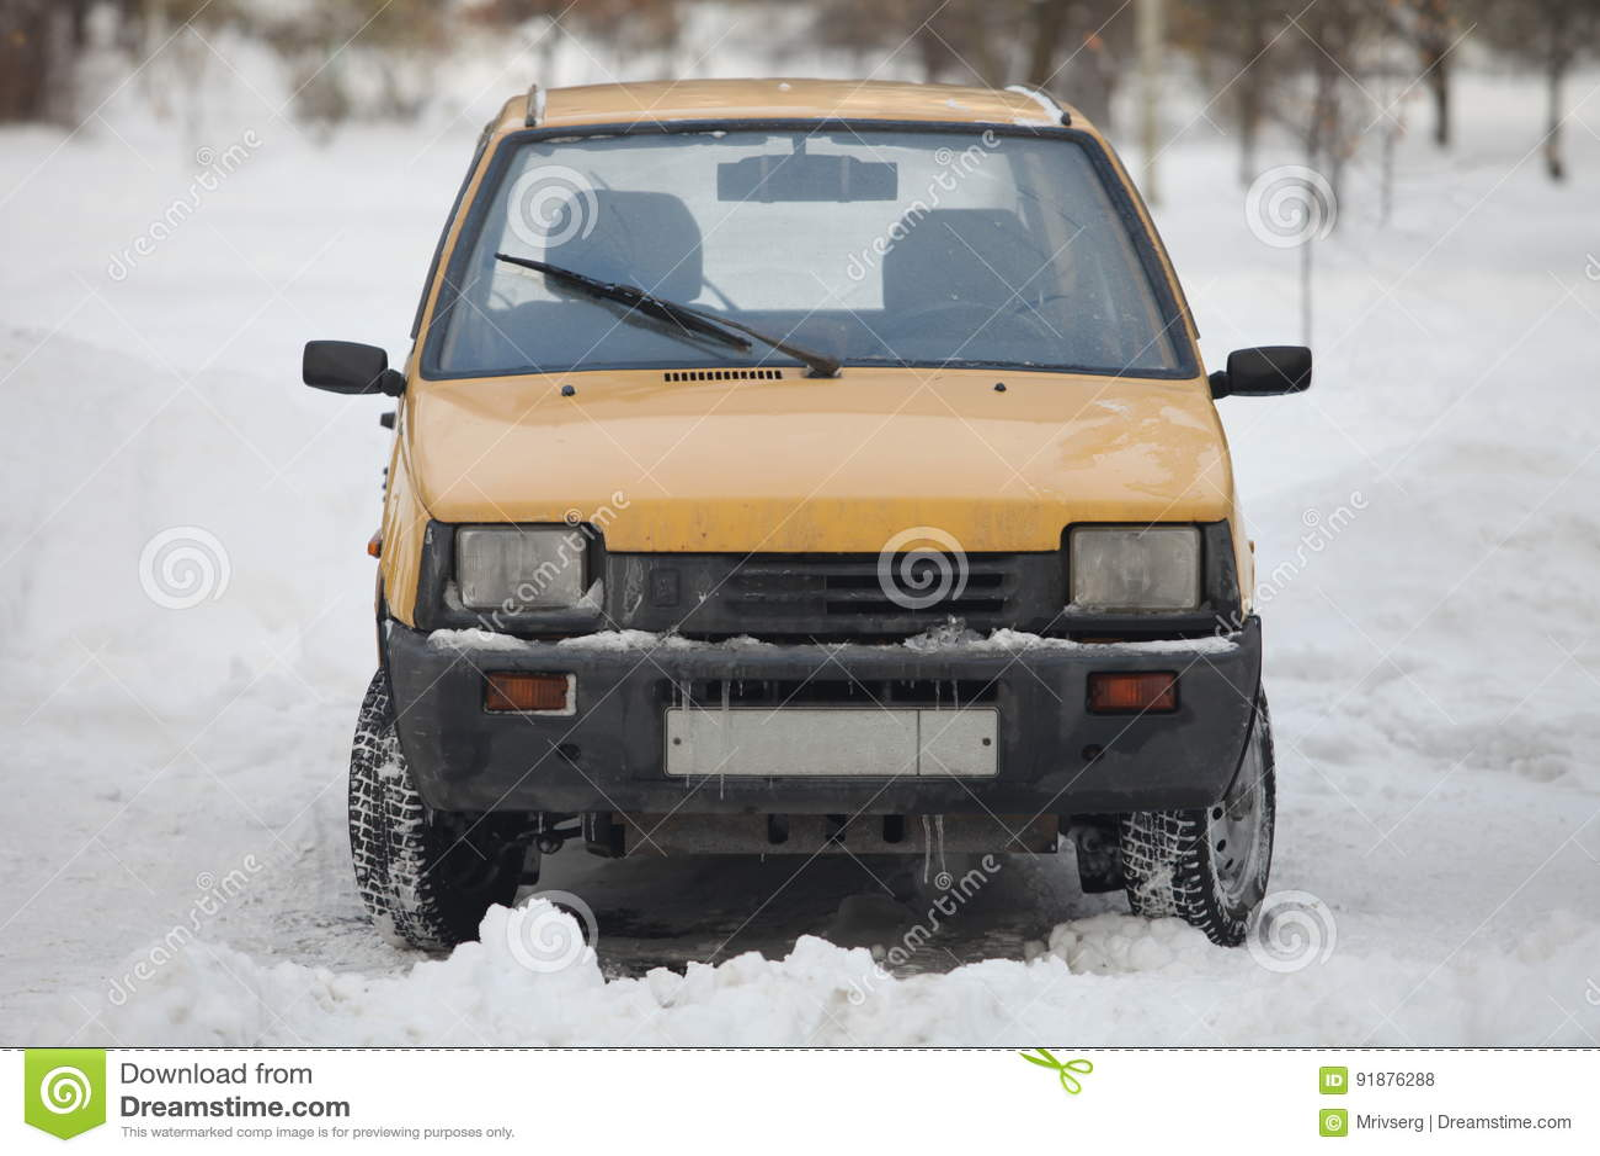 Minicar Vaz 1111 Oka Editorial Stock Photo Image Of Vehicle